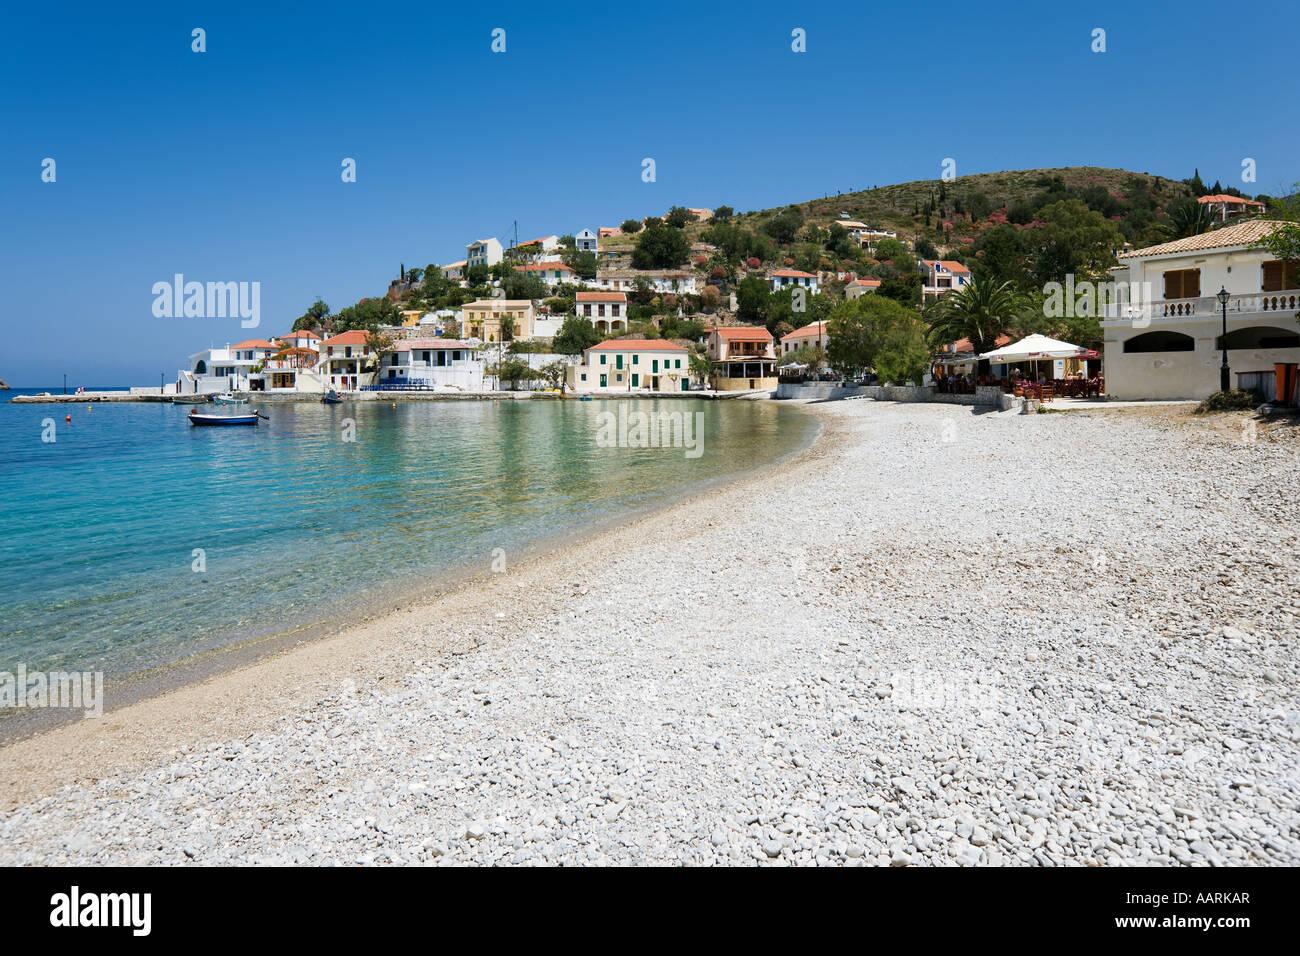 Town Beach, Assos, Kefalonia, Ionian Islands, Greece - Stock Image